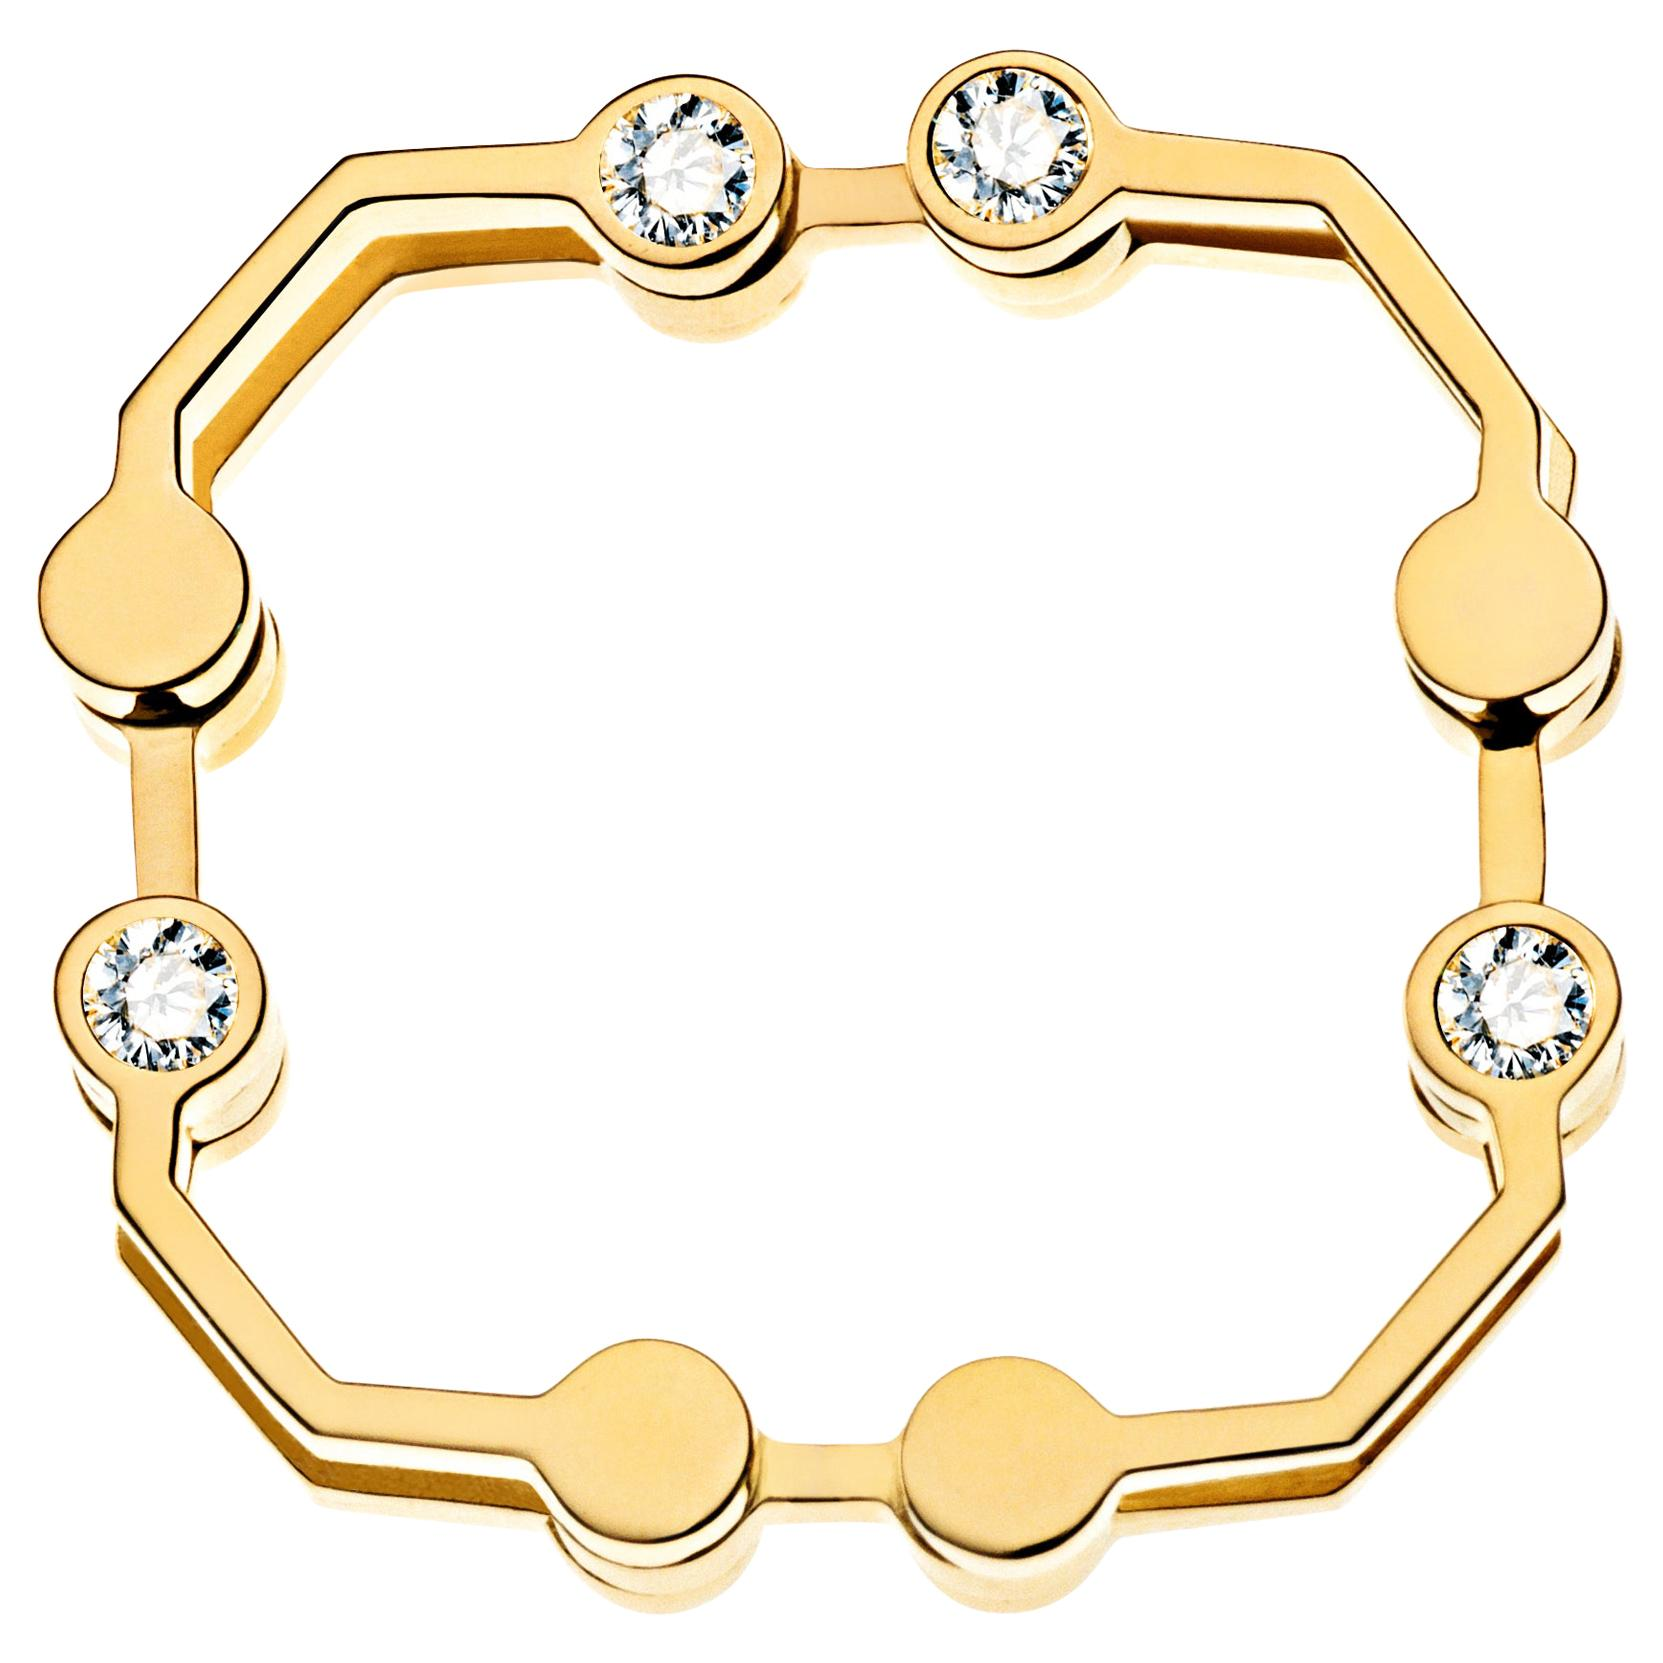 Nathalie Jean Contemporary 0.144 Carat Diamond 18 Karat Gold Articulated Ring